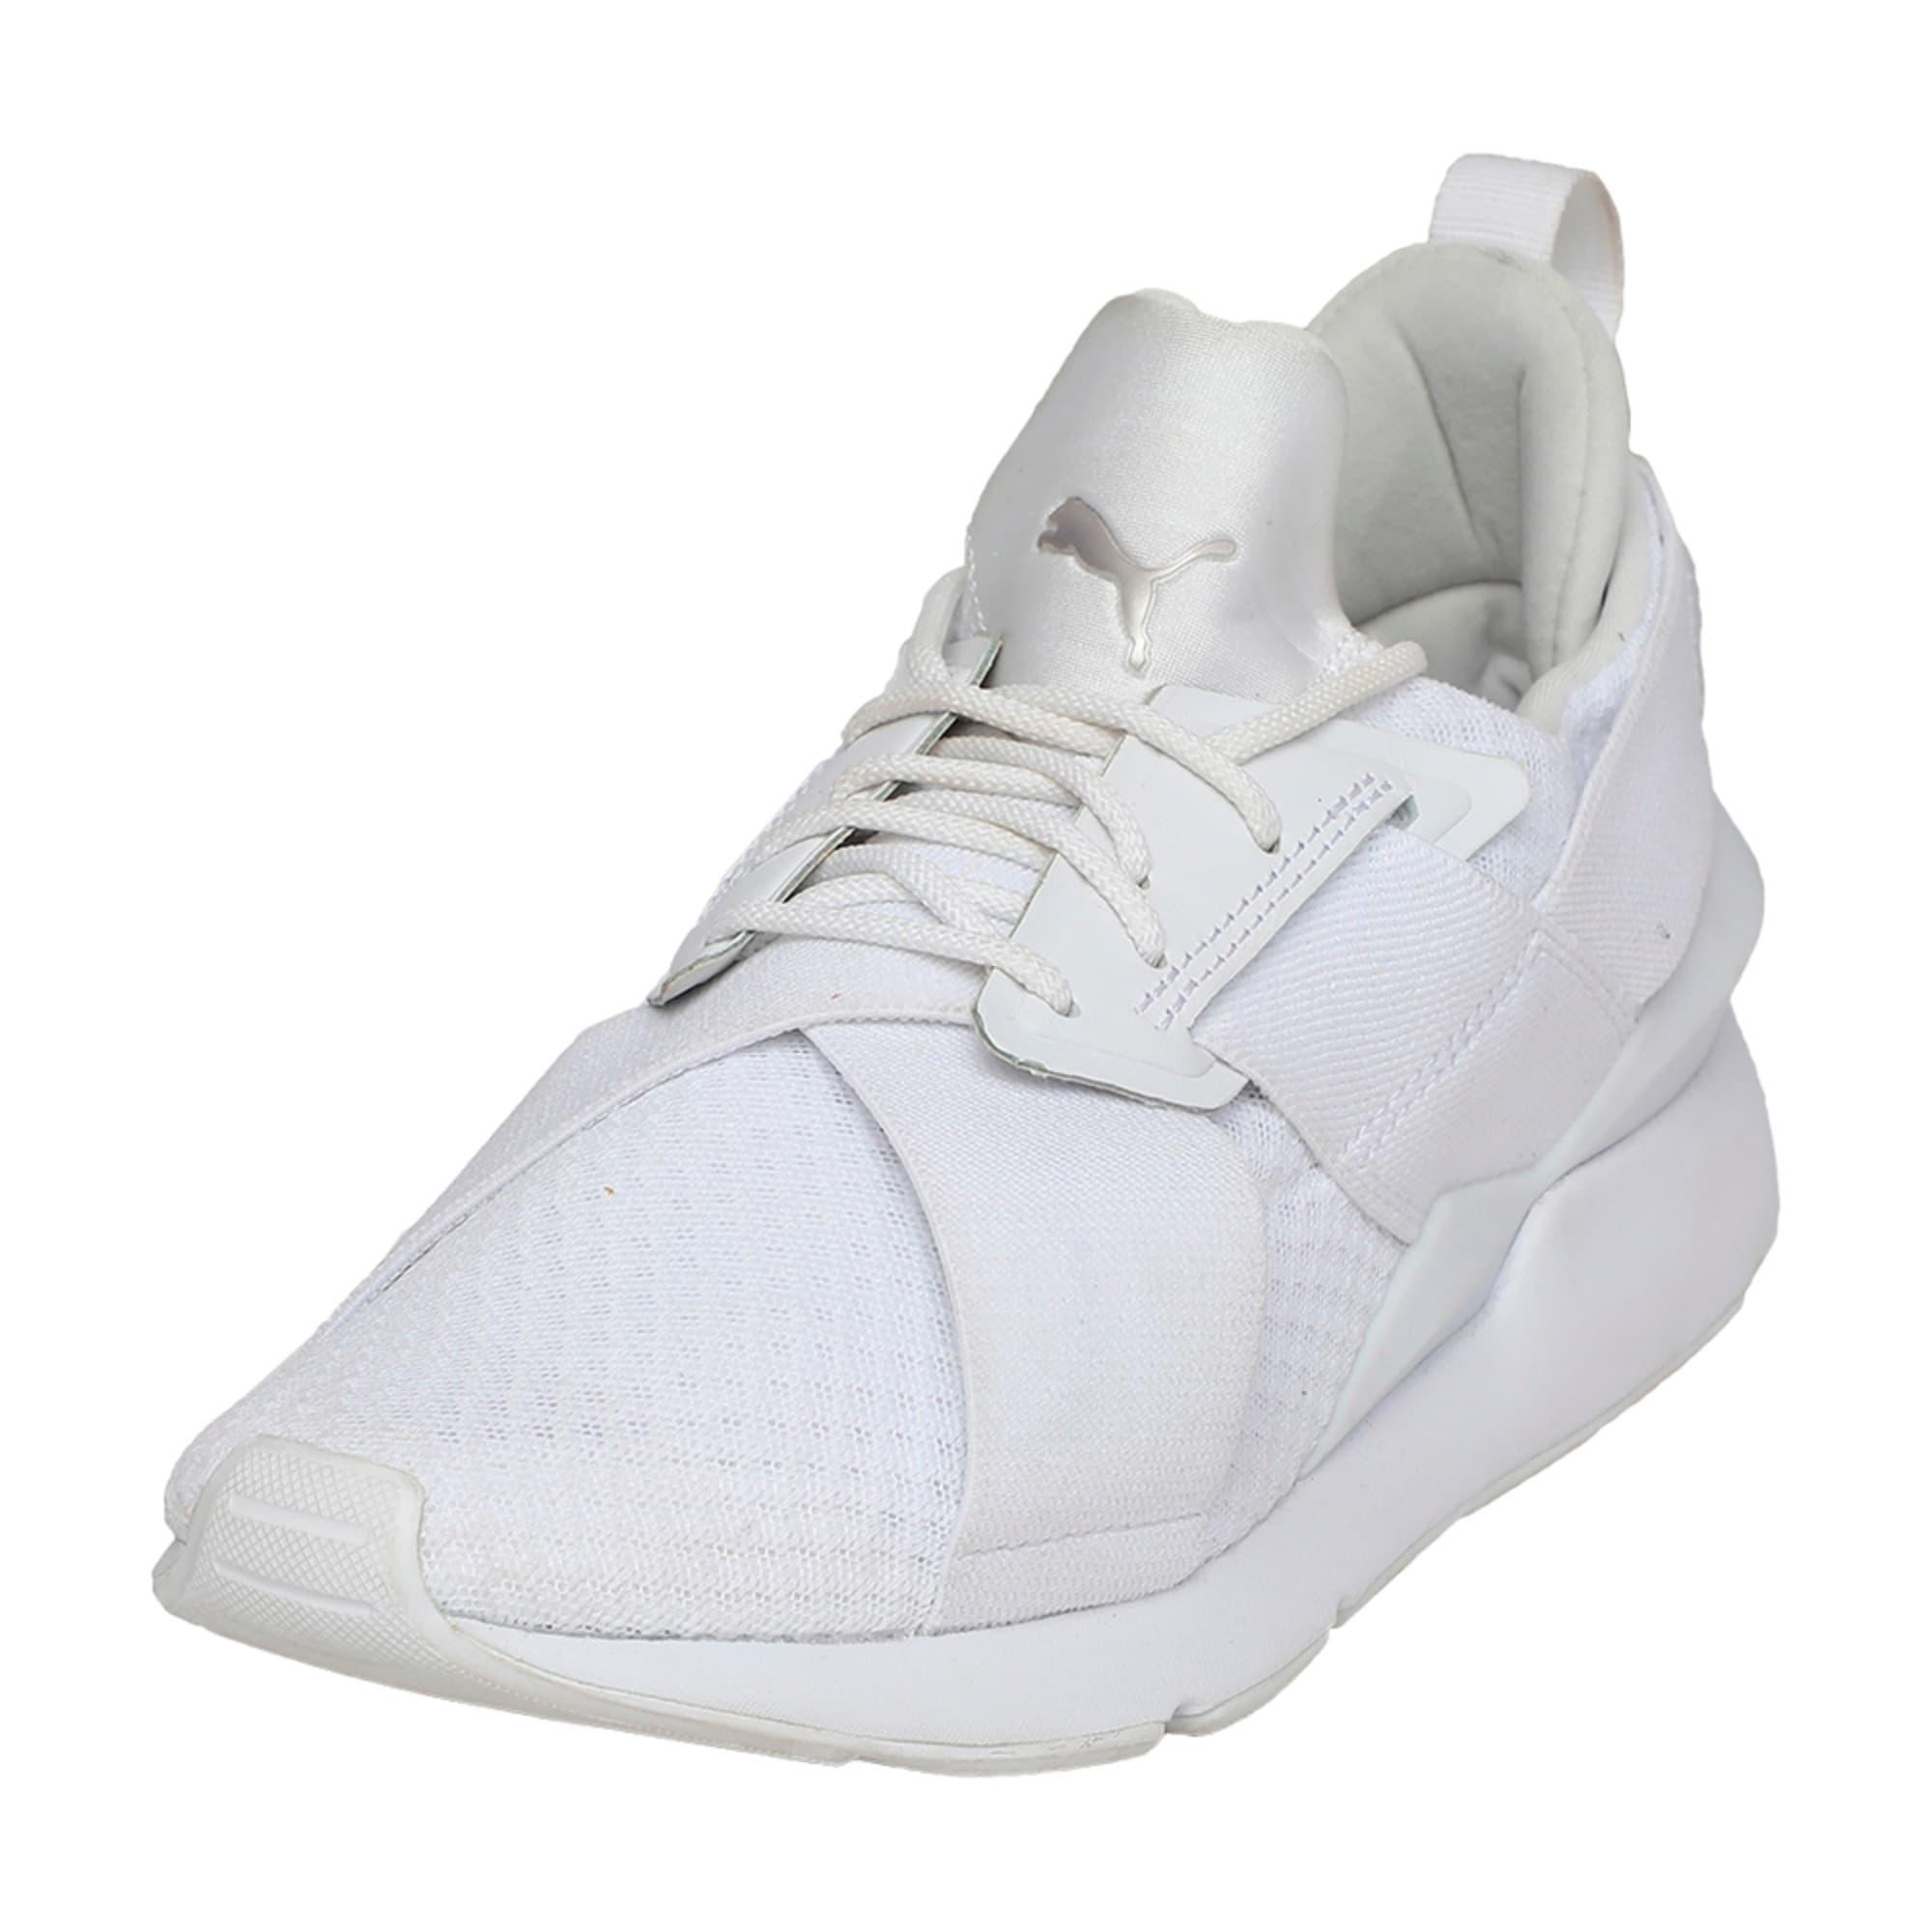 Thumbnail 1 of Muse En Pointe Women's Shoes, Puma White-Puma White, medium-IND